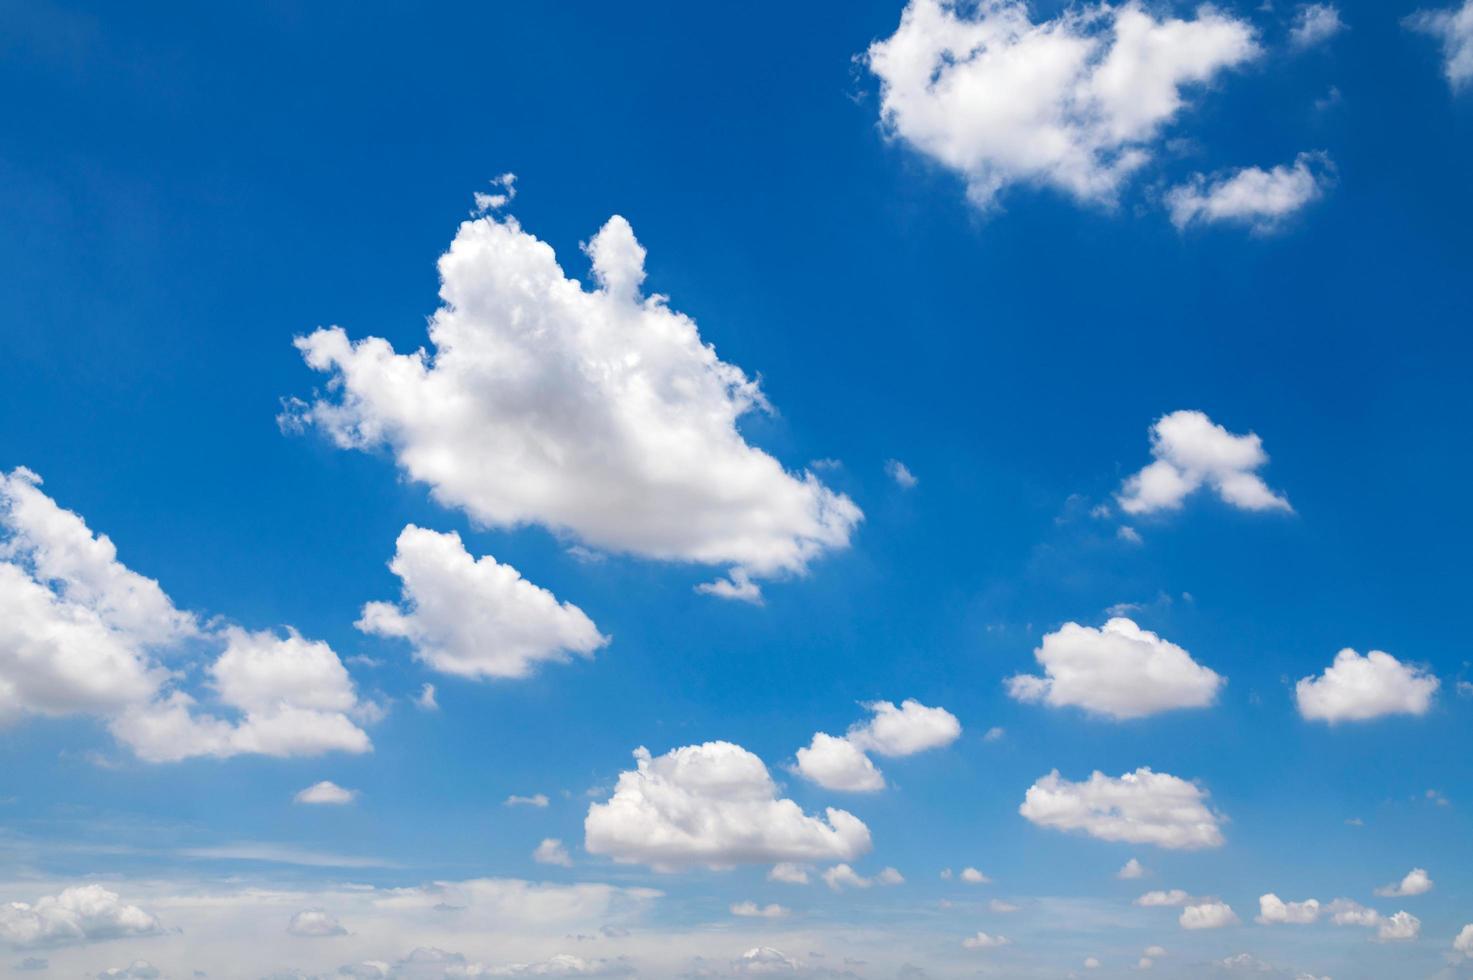 nuvole bianche sul cielo blu foto